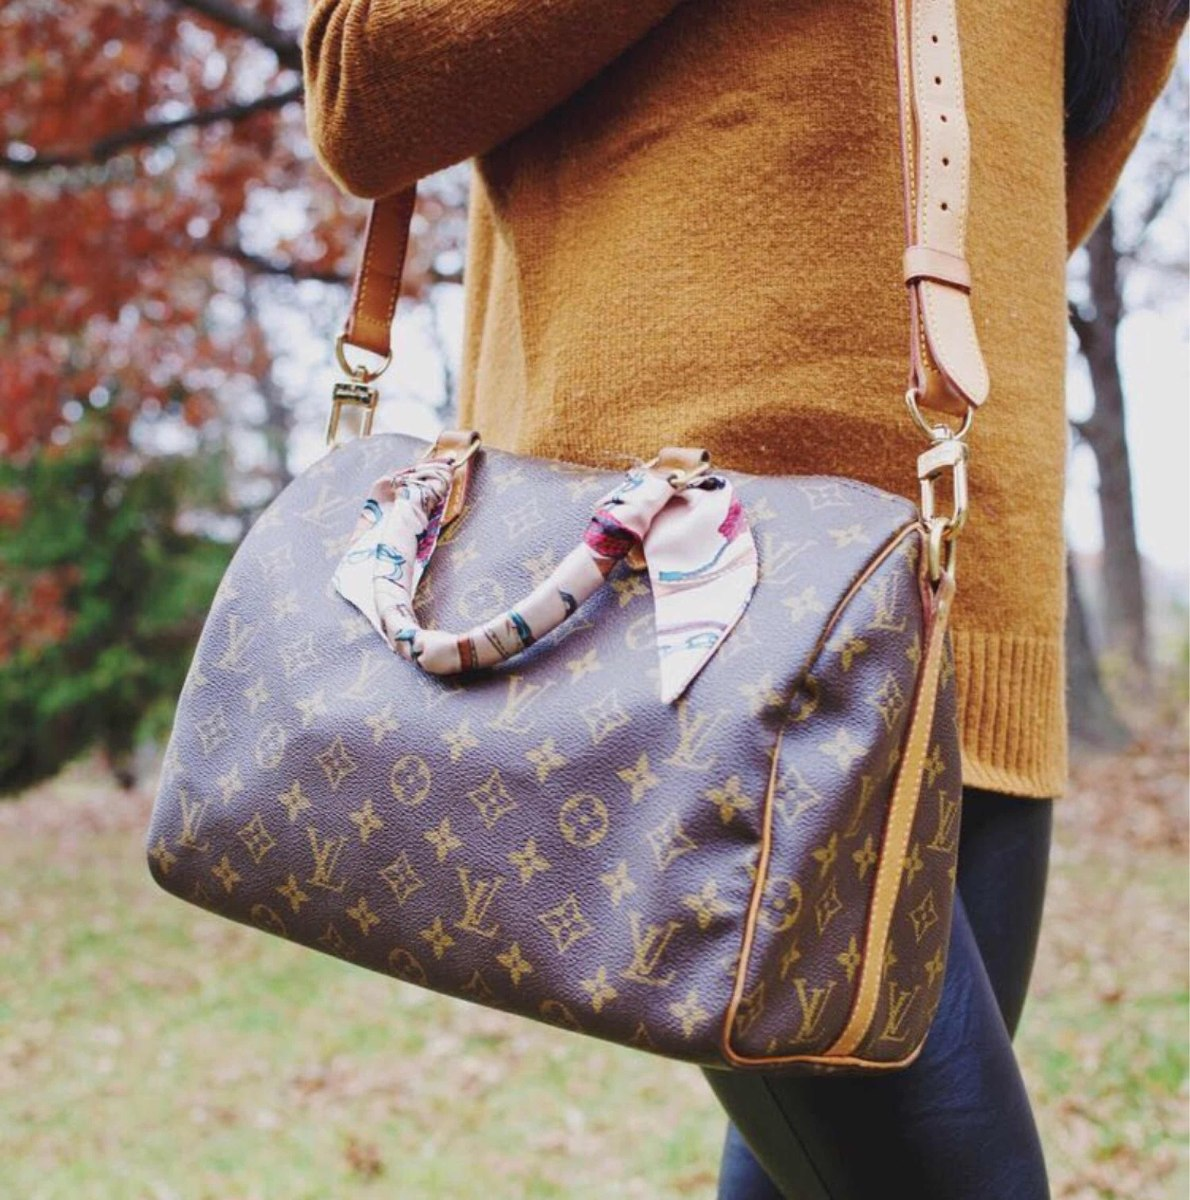 6d759fb1d67 Bolsa Louis Vuitton Speedy Bandouliere 30 Monograma - R  899